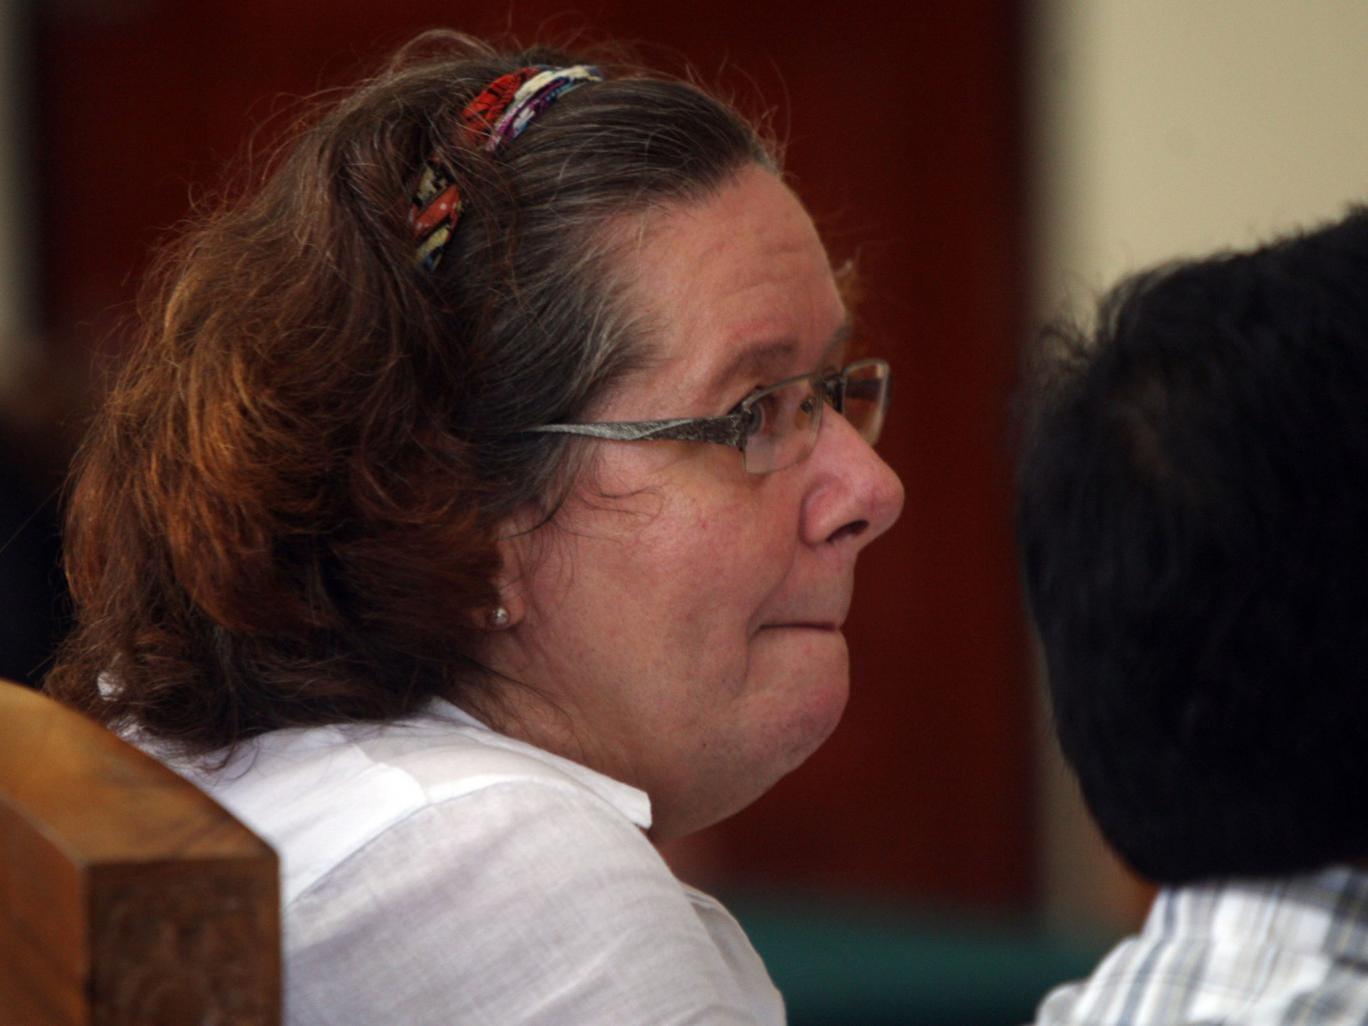 British woman Lindsay Sandiford has been sentenced to death